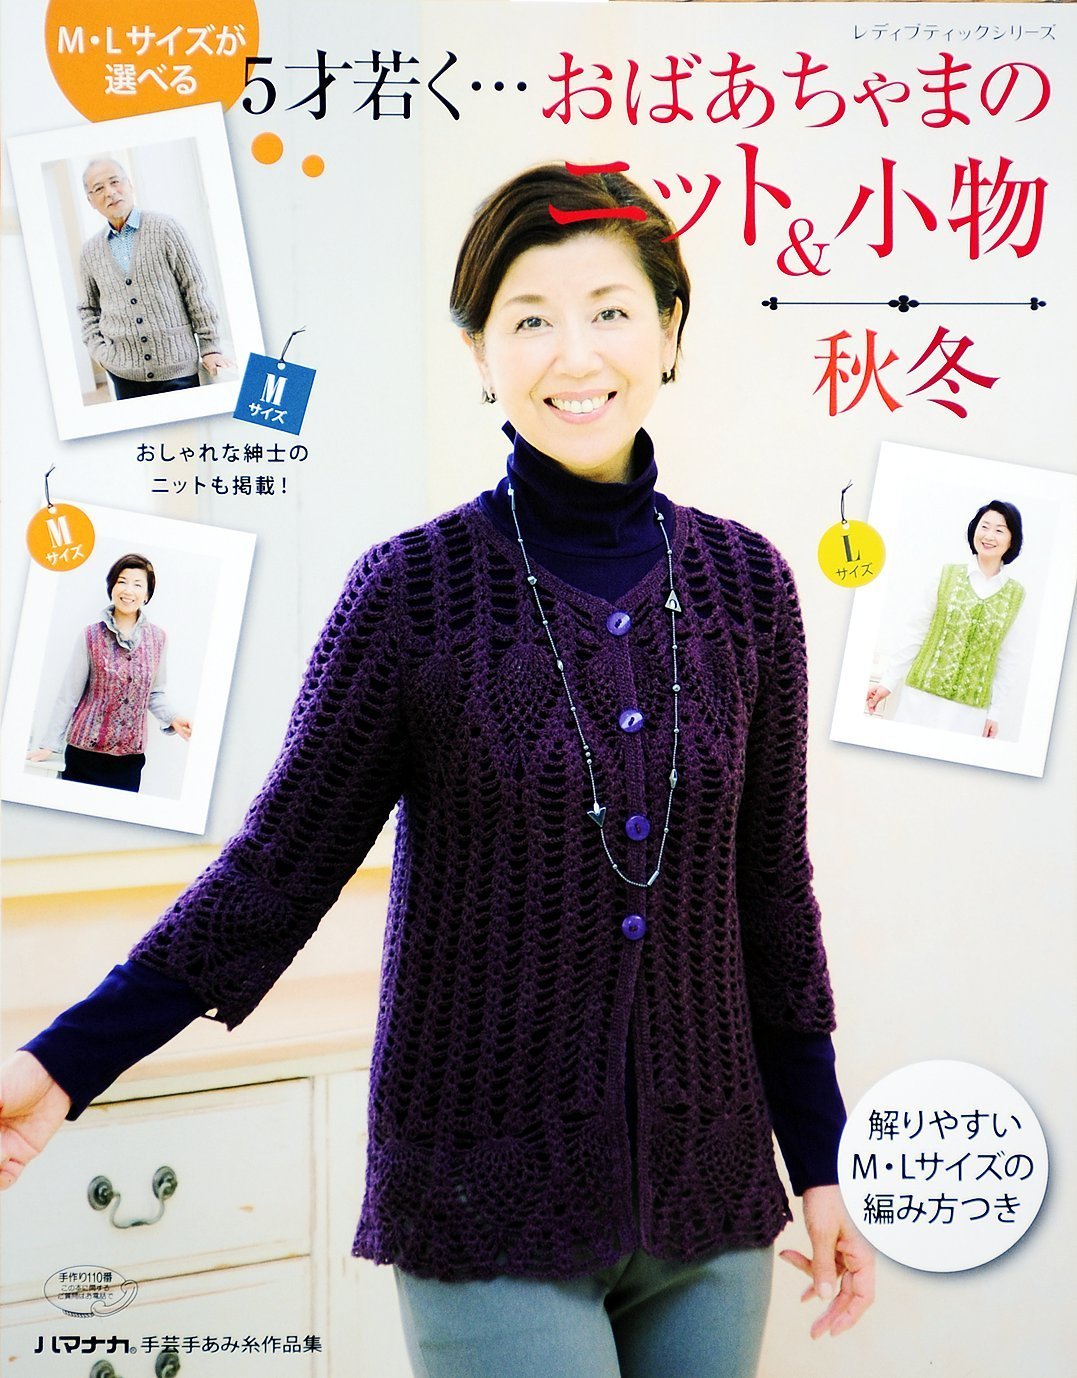 Obaa Chama knit & accessories 2015-2016 Fall